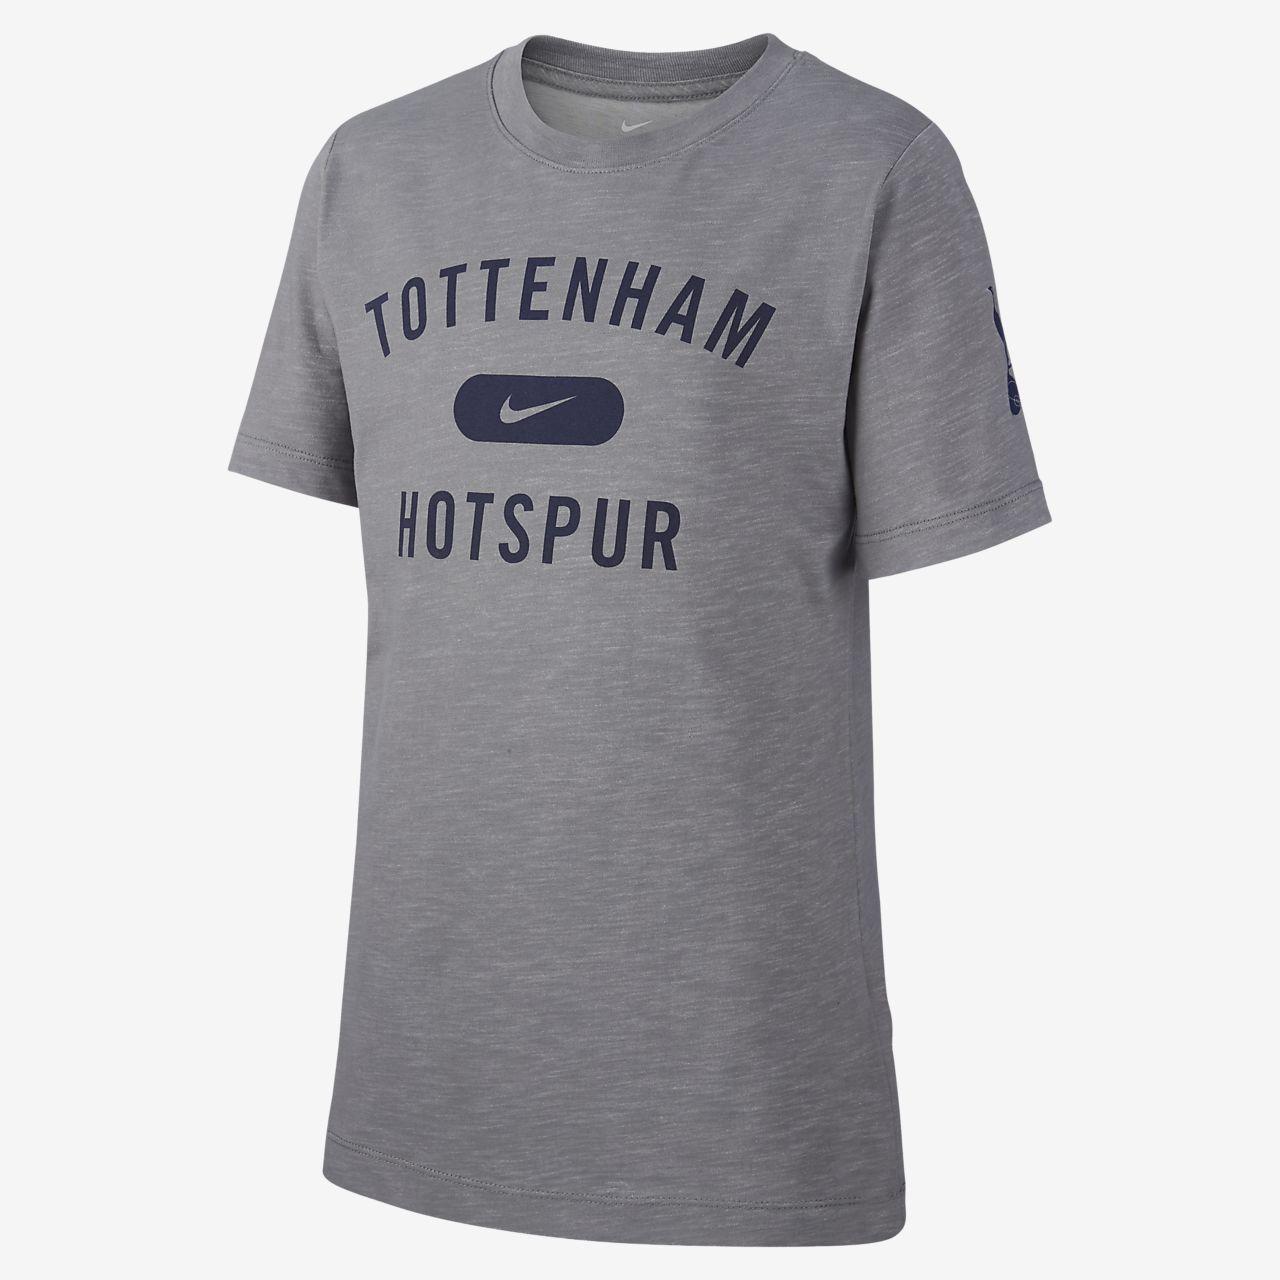 Nike Dri-FIT Tottenham Hotspur Older Kids  Football T-Shirt. Nike.com ZA 5a3c0ac53